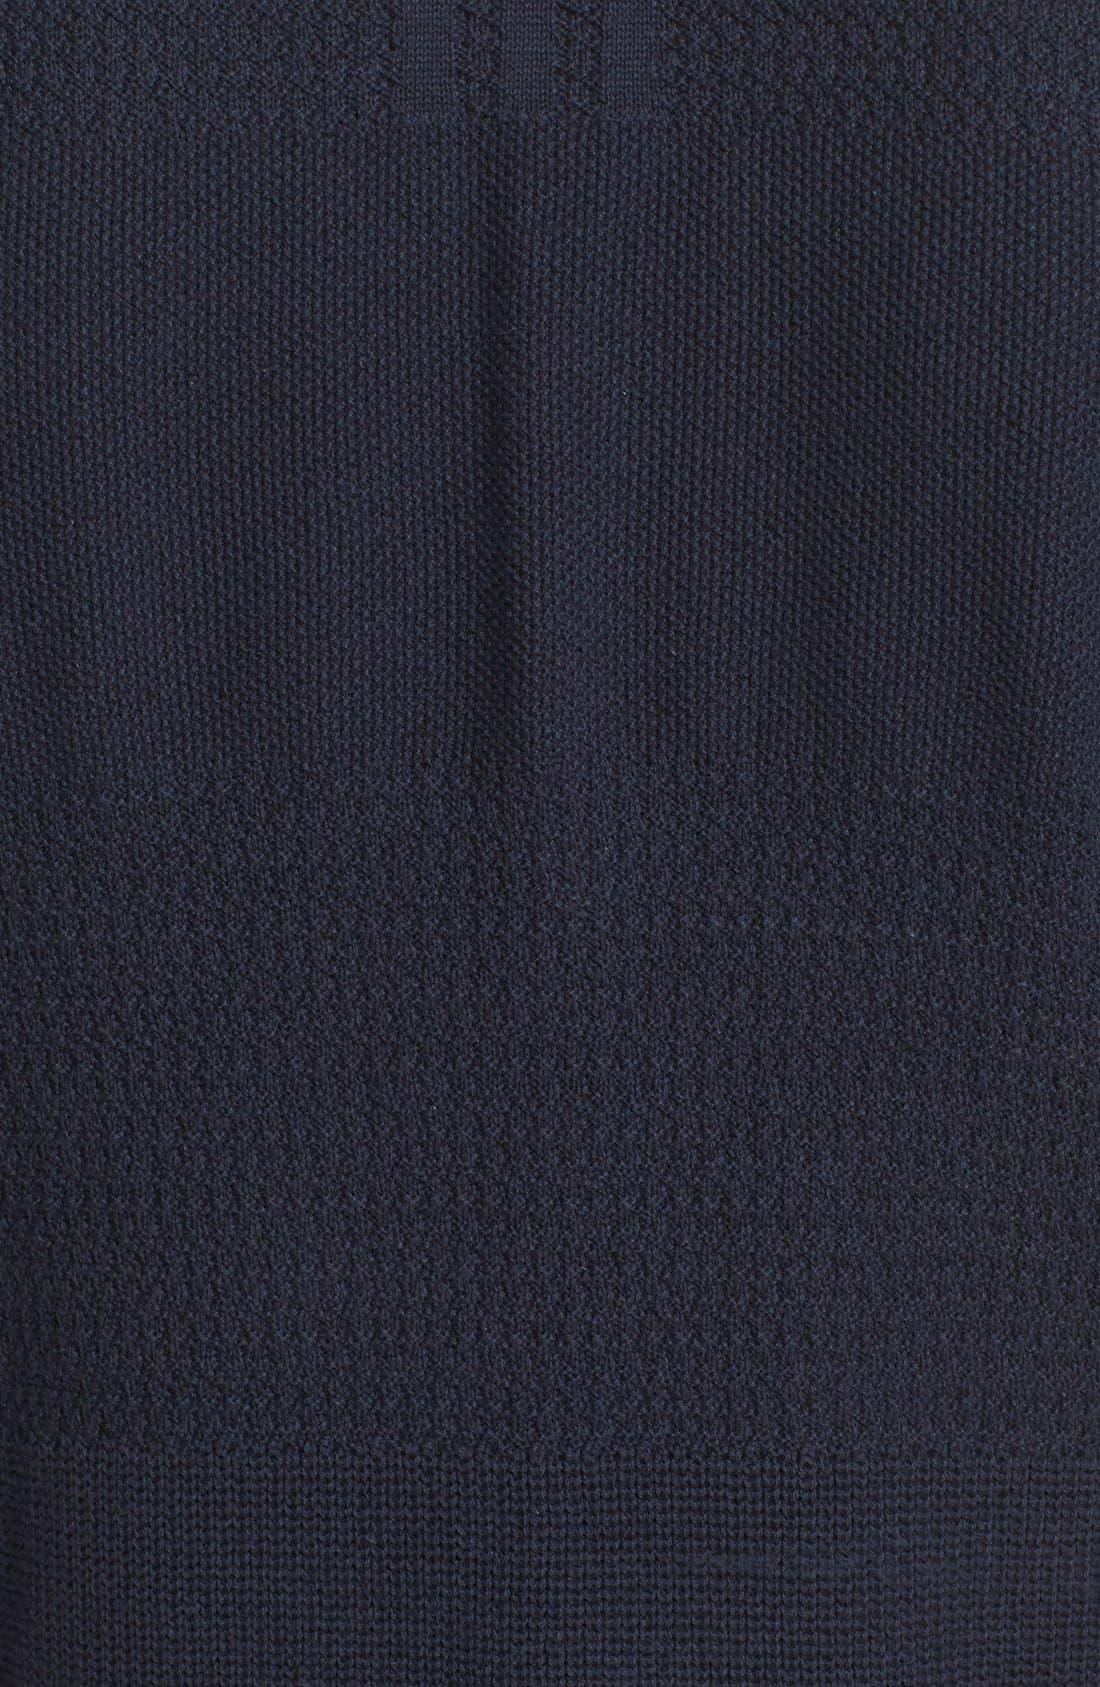 Alternate Image 5  - wings + horns x adidas Linear Cotton & Linen T-Shirt